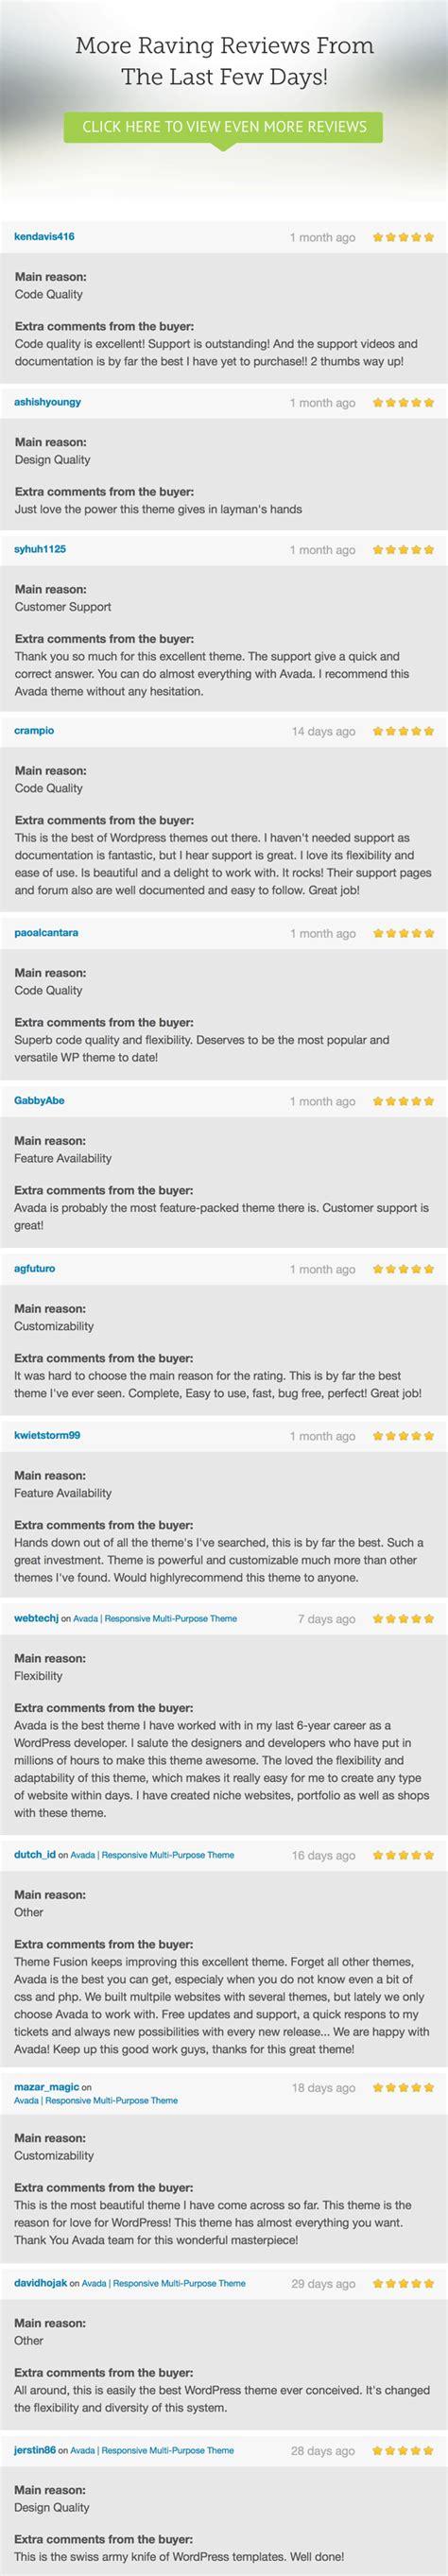 avada theme latest version free download avada responsive multi purpose theme zim templates